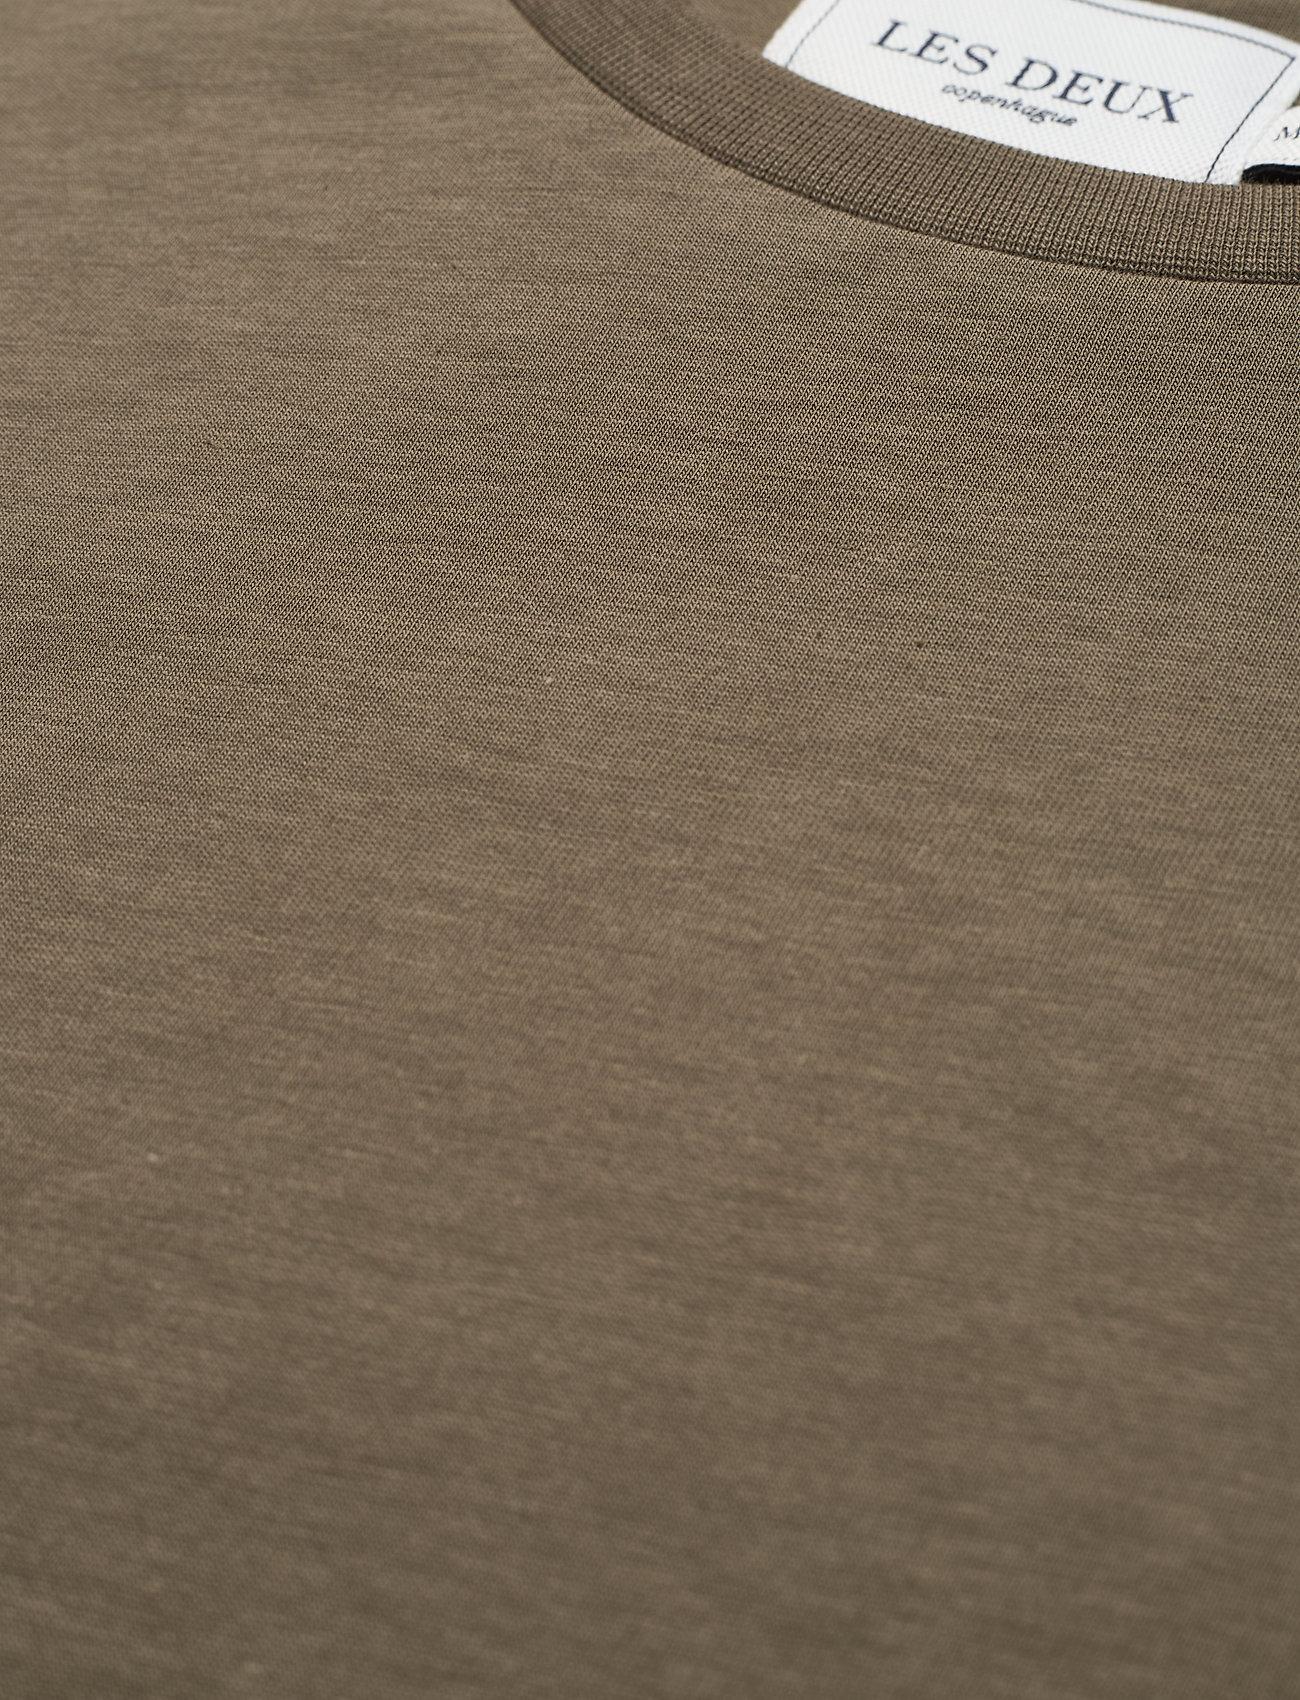 Les Deux Nørregaard T-Shirt - T-skjorter TURTLE GREEN/ORANGE - Menn Klær